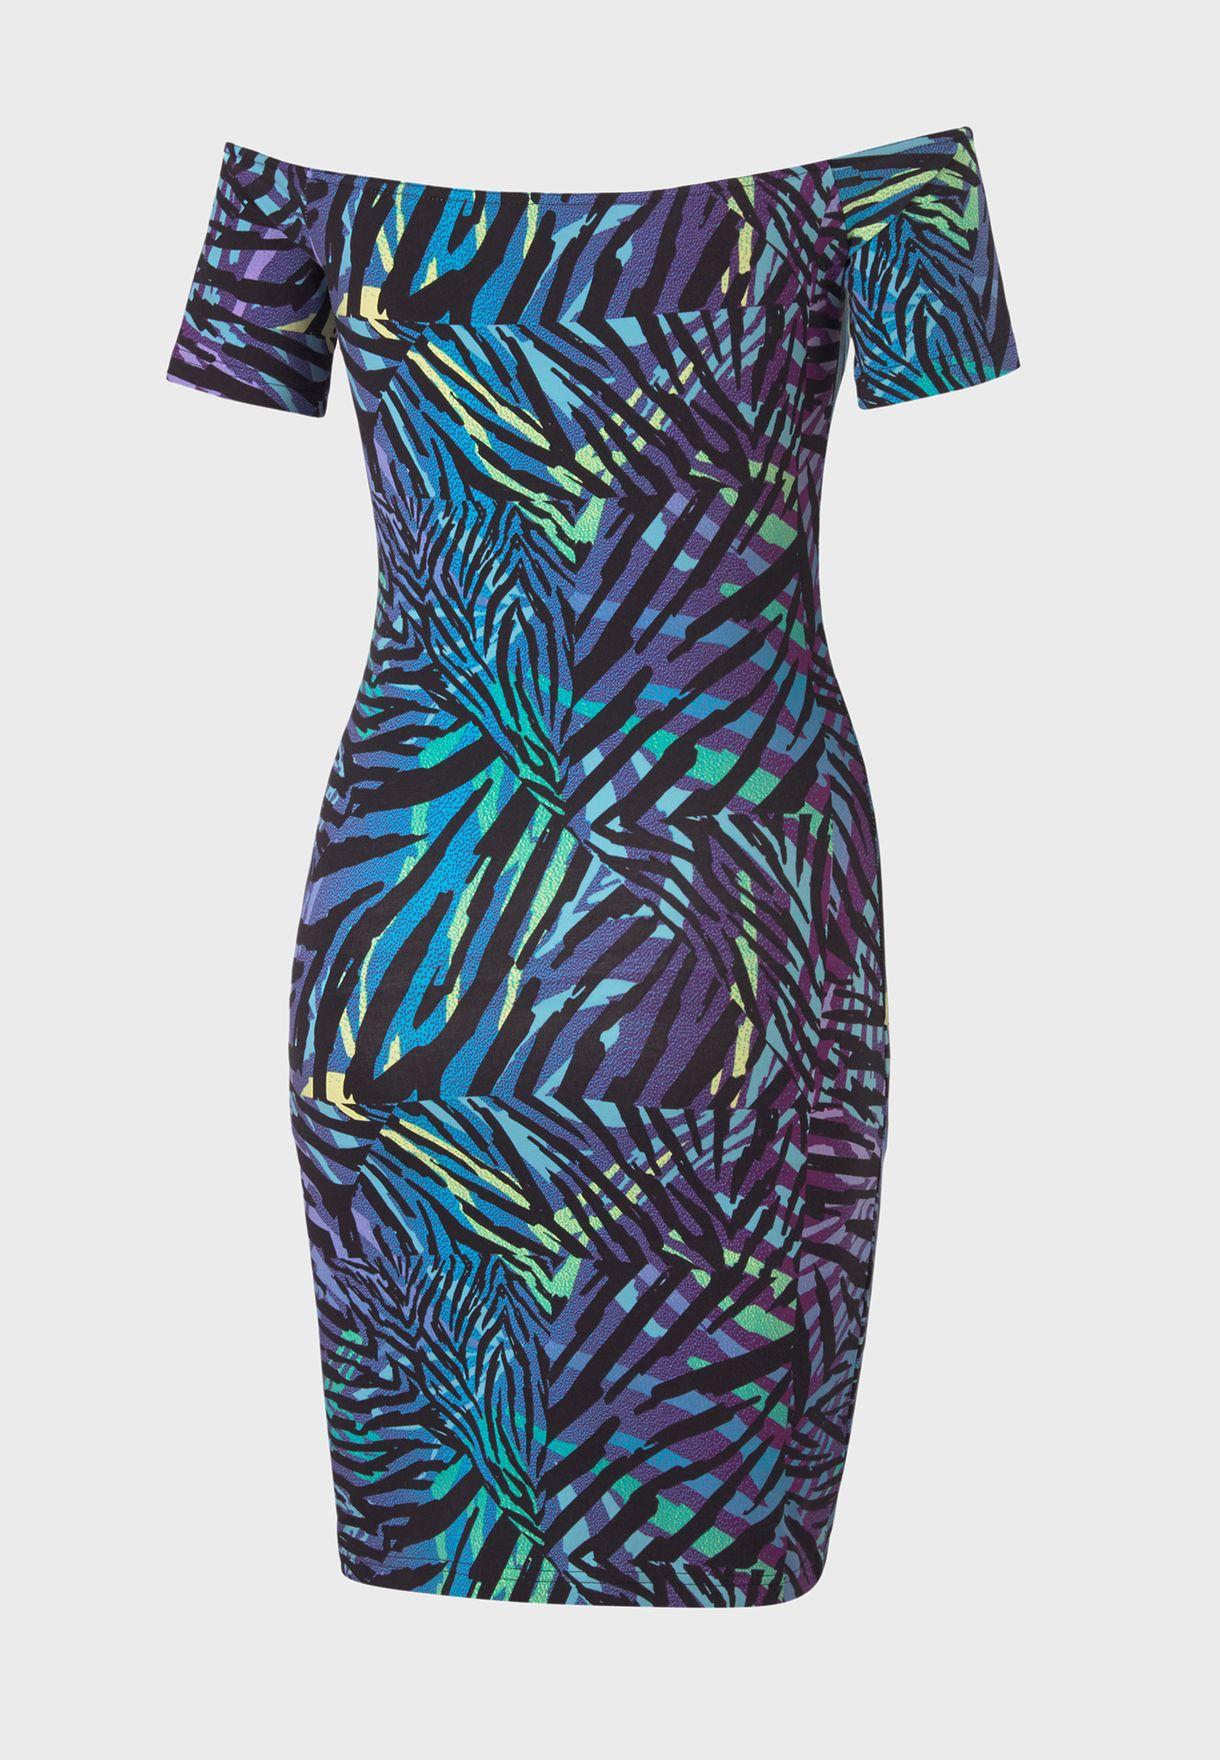 CG Slim Dress